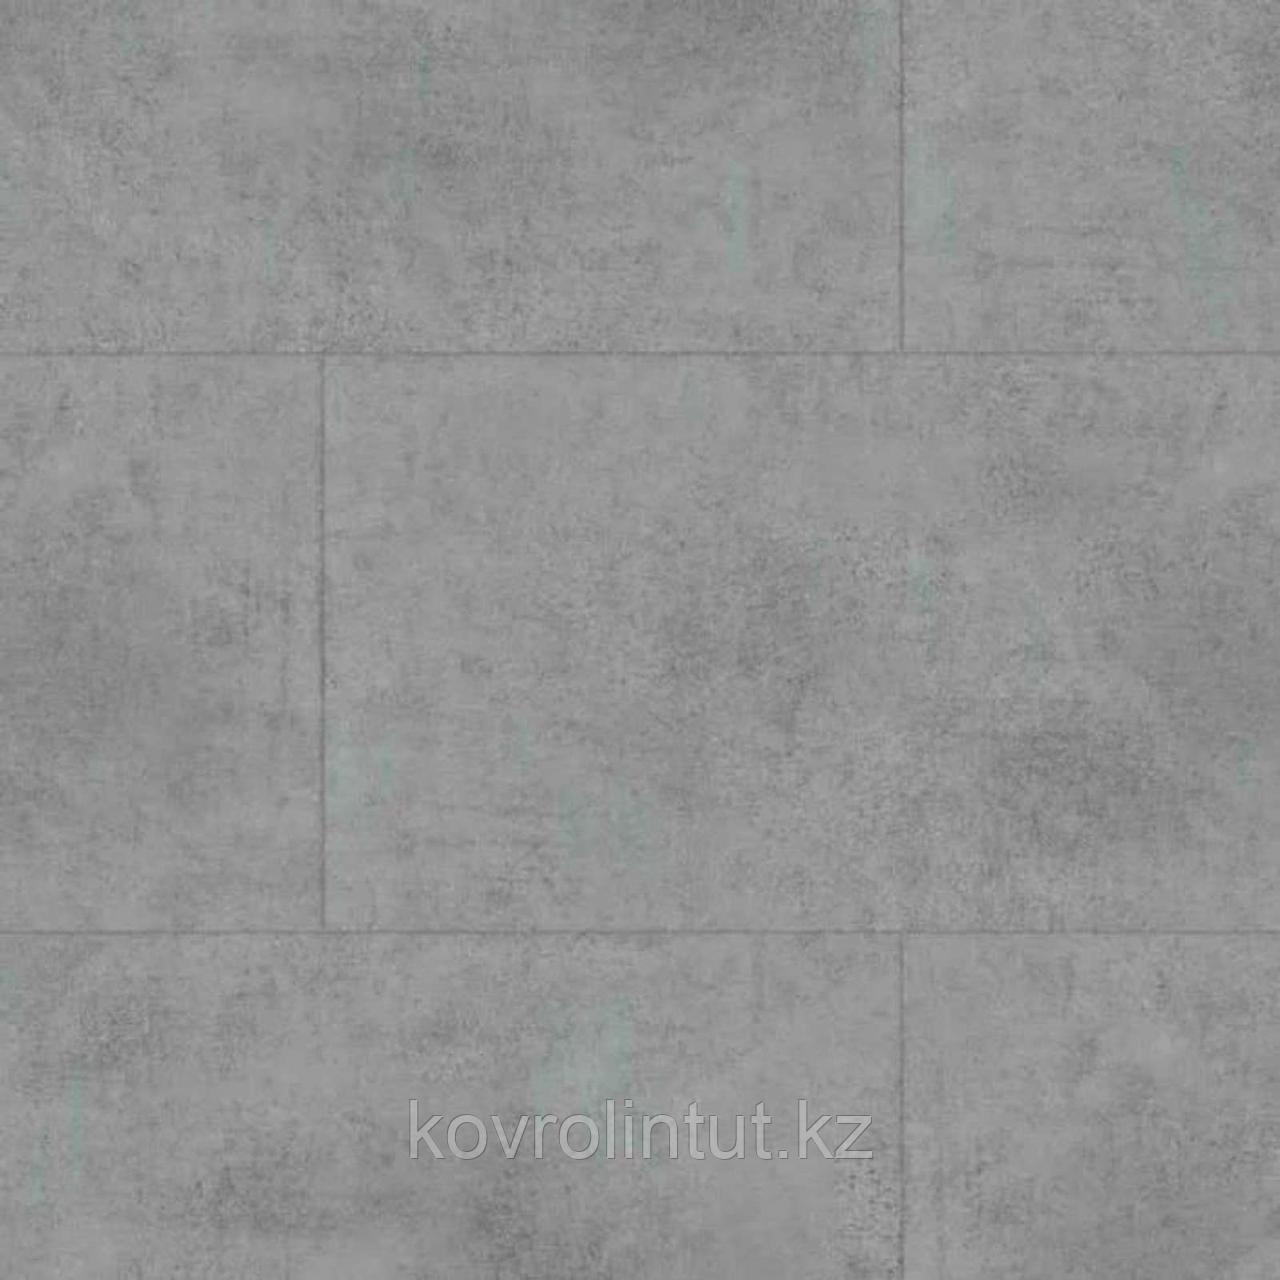 Плитка ПВХ клеевая Arbiton Aroq Brooklyn Concrete DA121